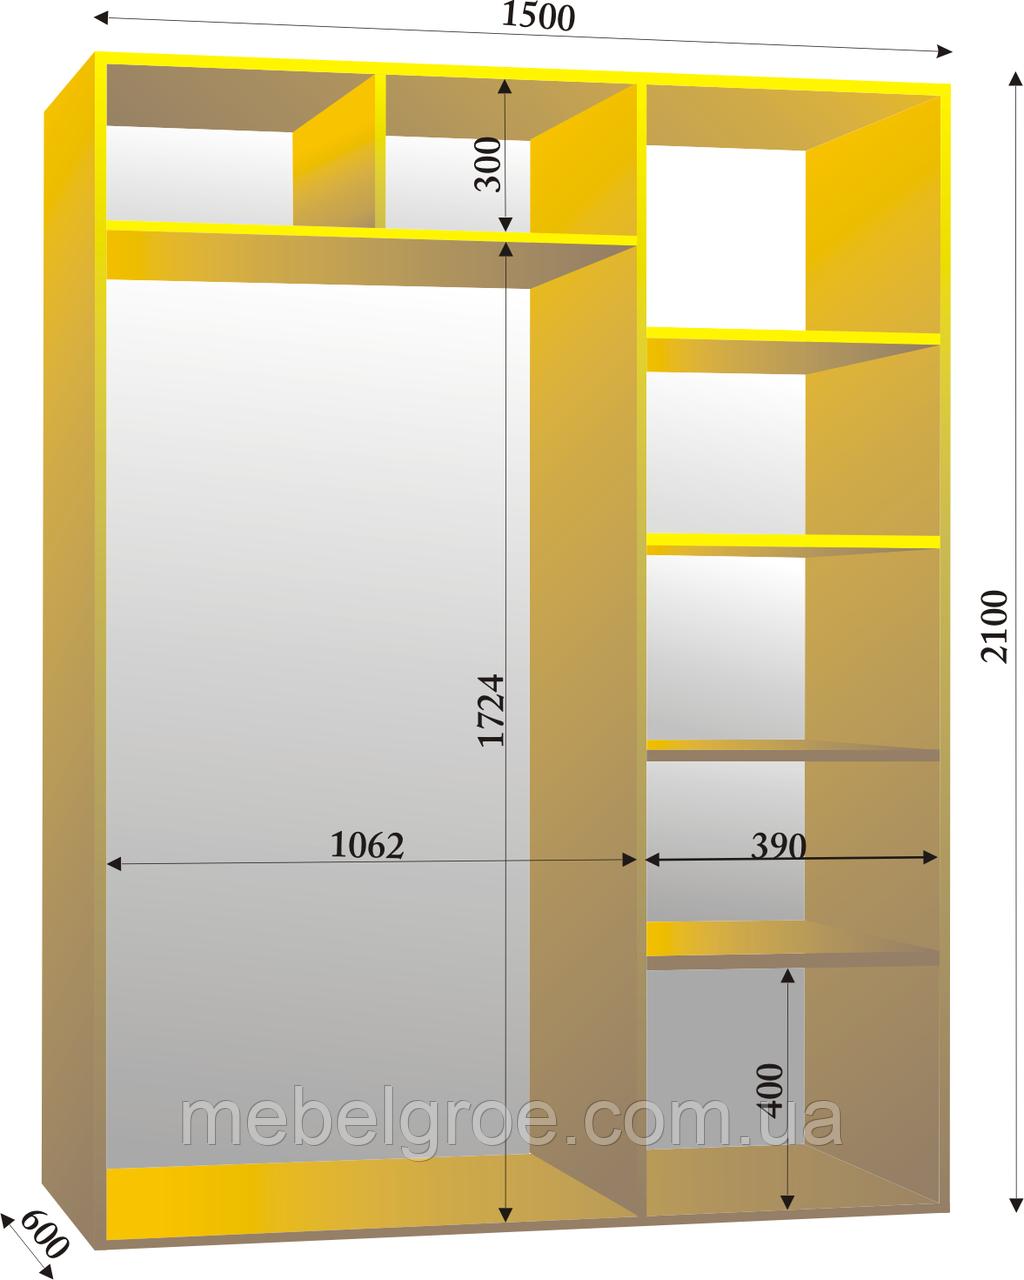 Шкаф-купе двухдверный 1500х600х2100 тм Эксклюзив